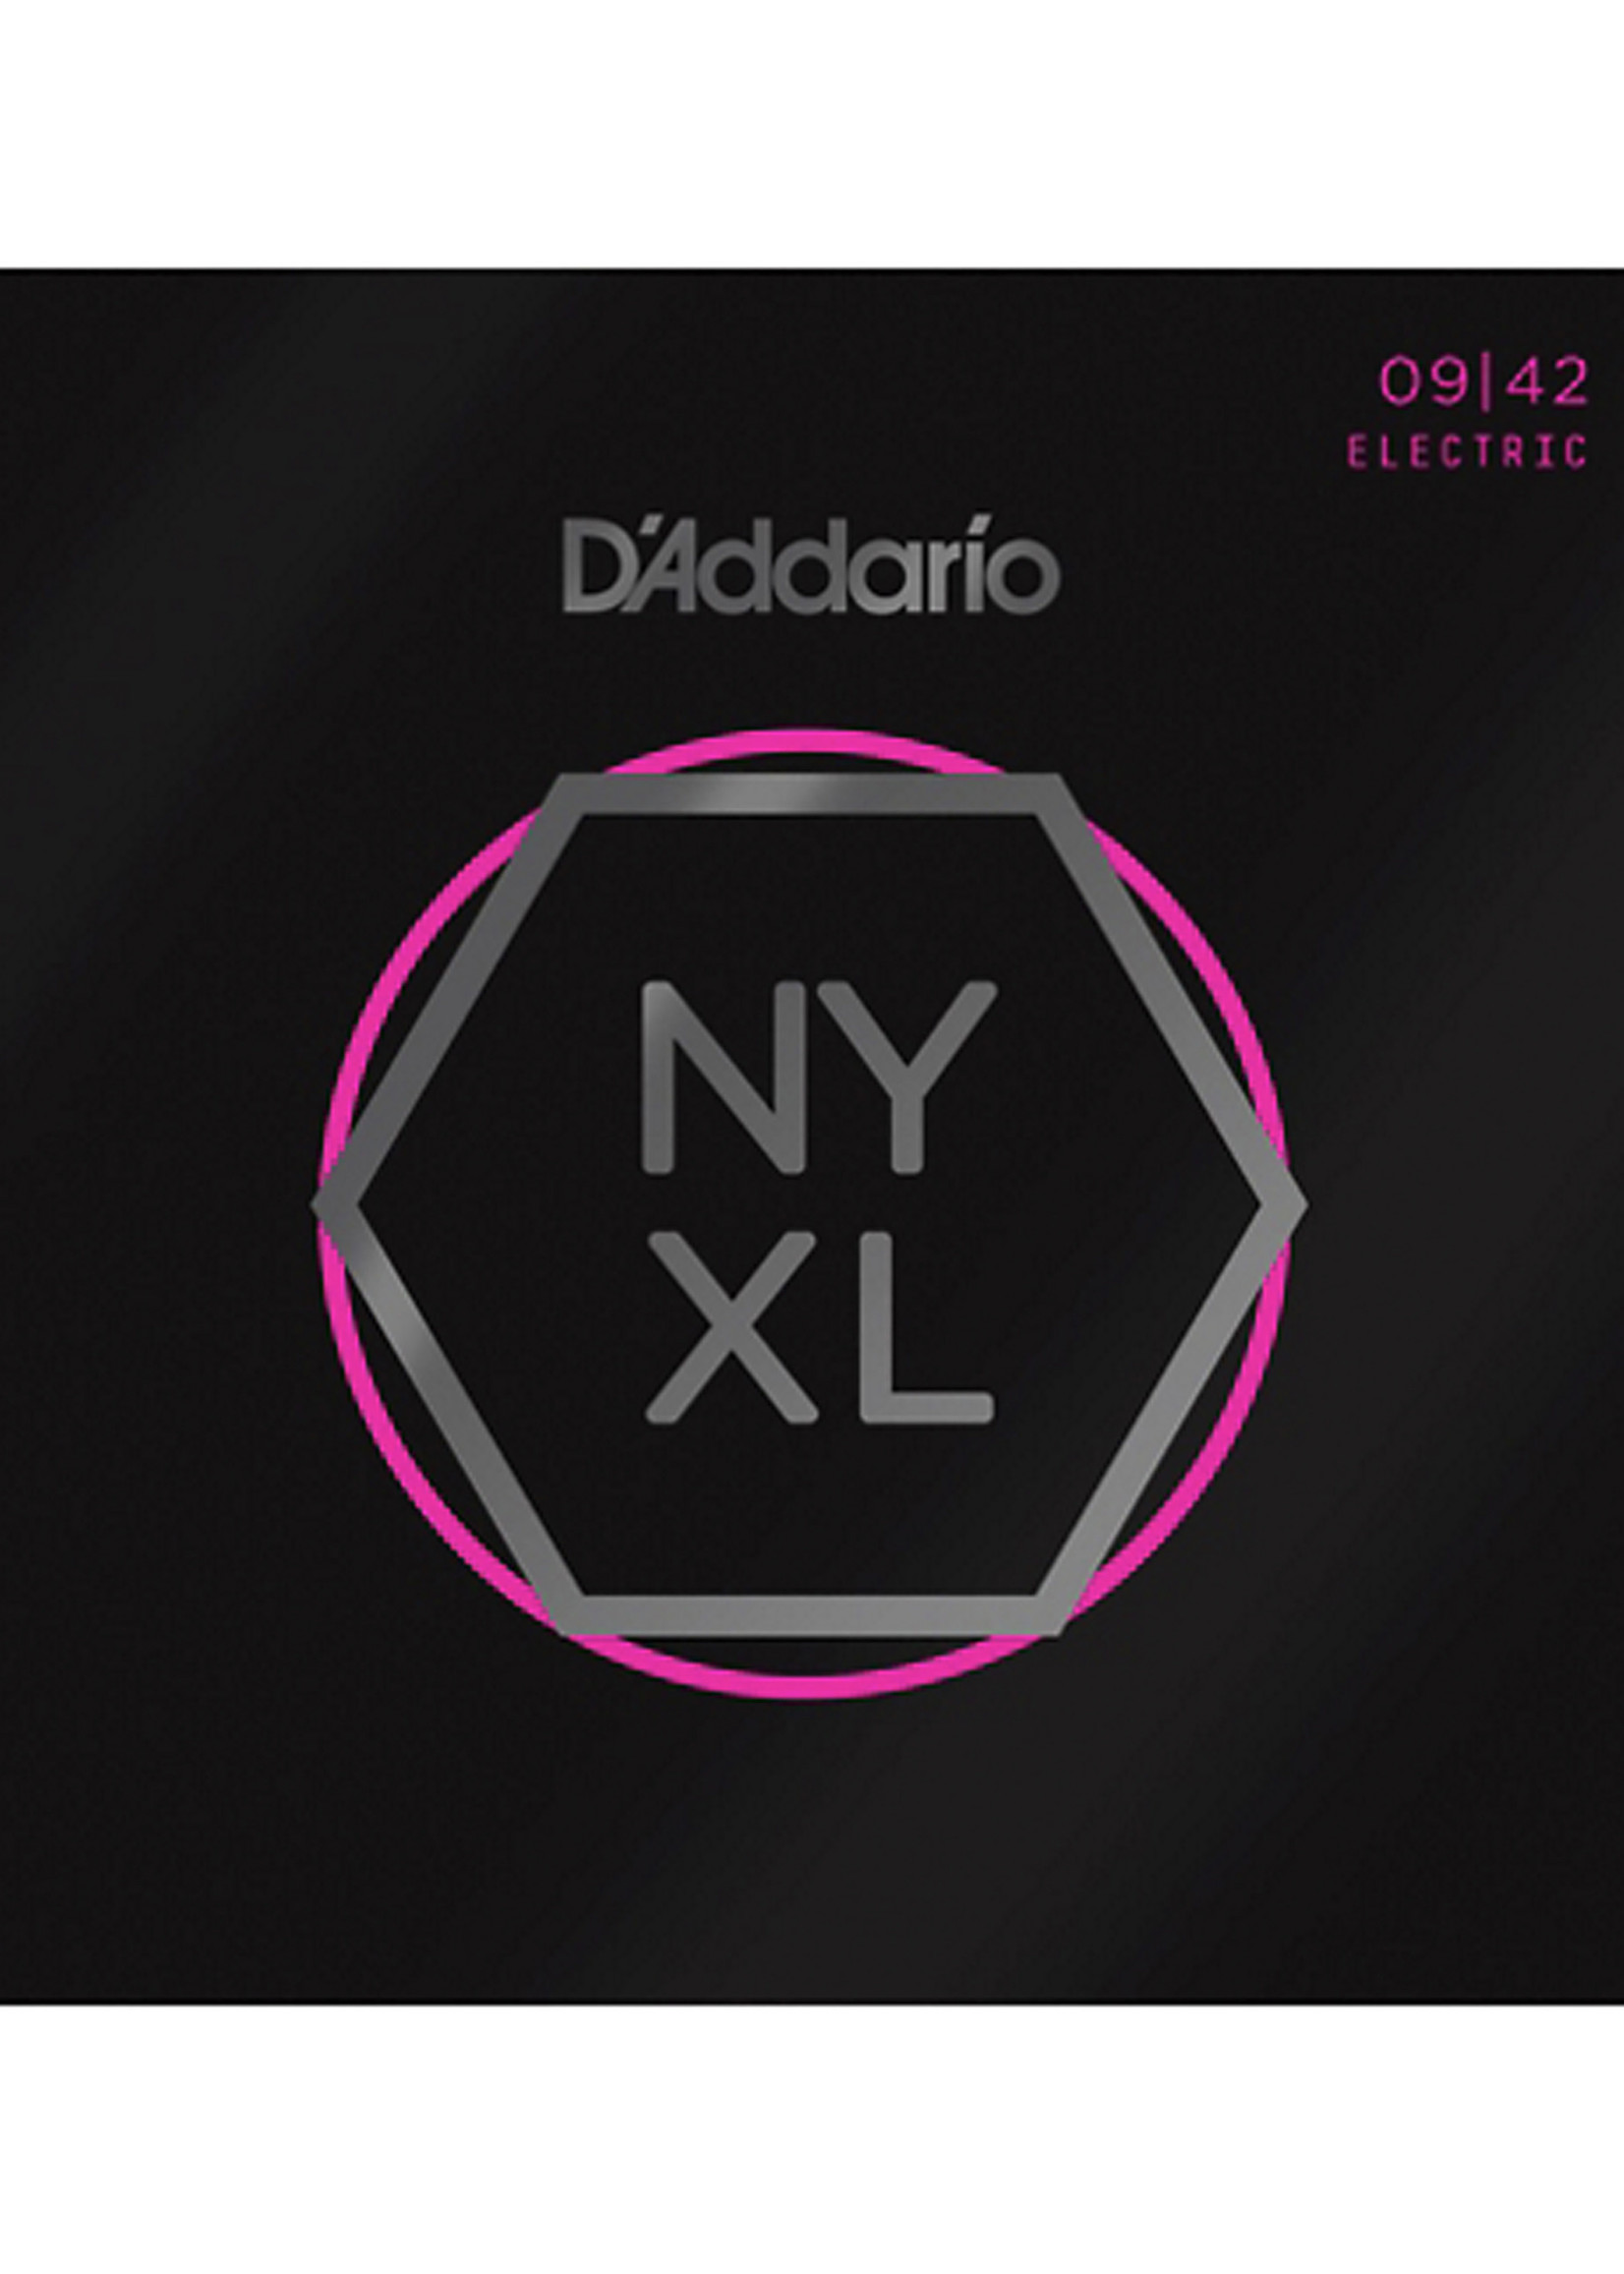 DAddario Fretted D'Addario NYXL 9-42 Super Light